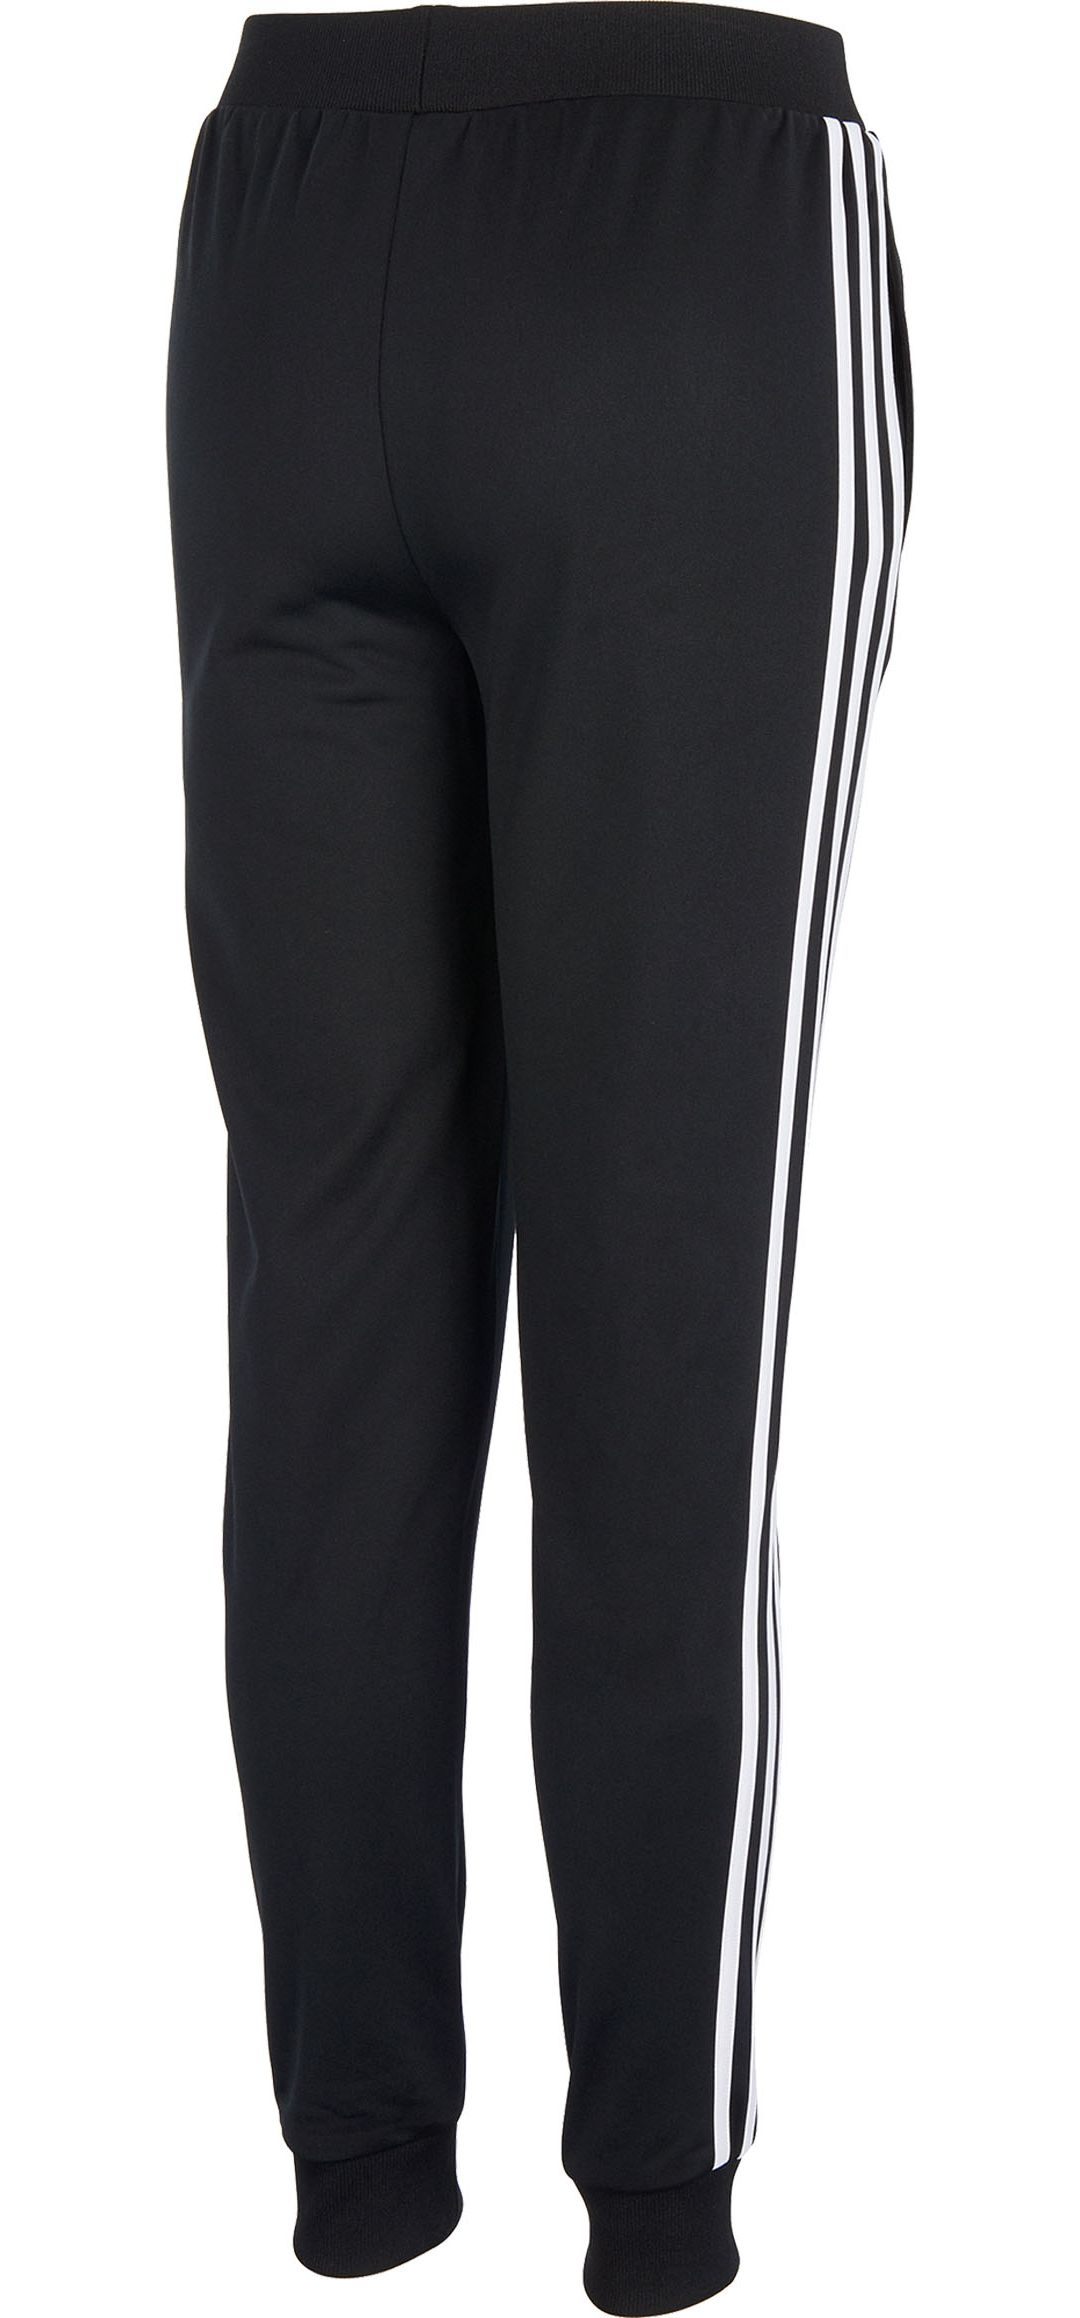 506baf29 adidas Girls' Tricot Jogger Pants